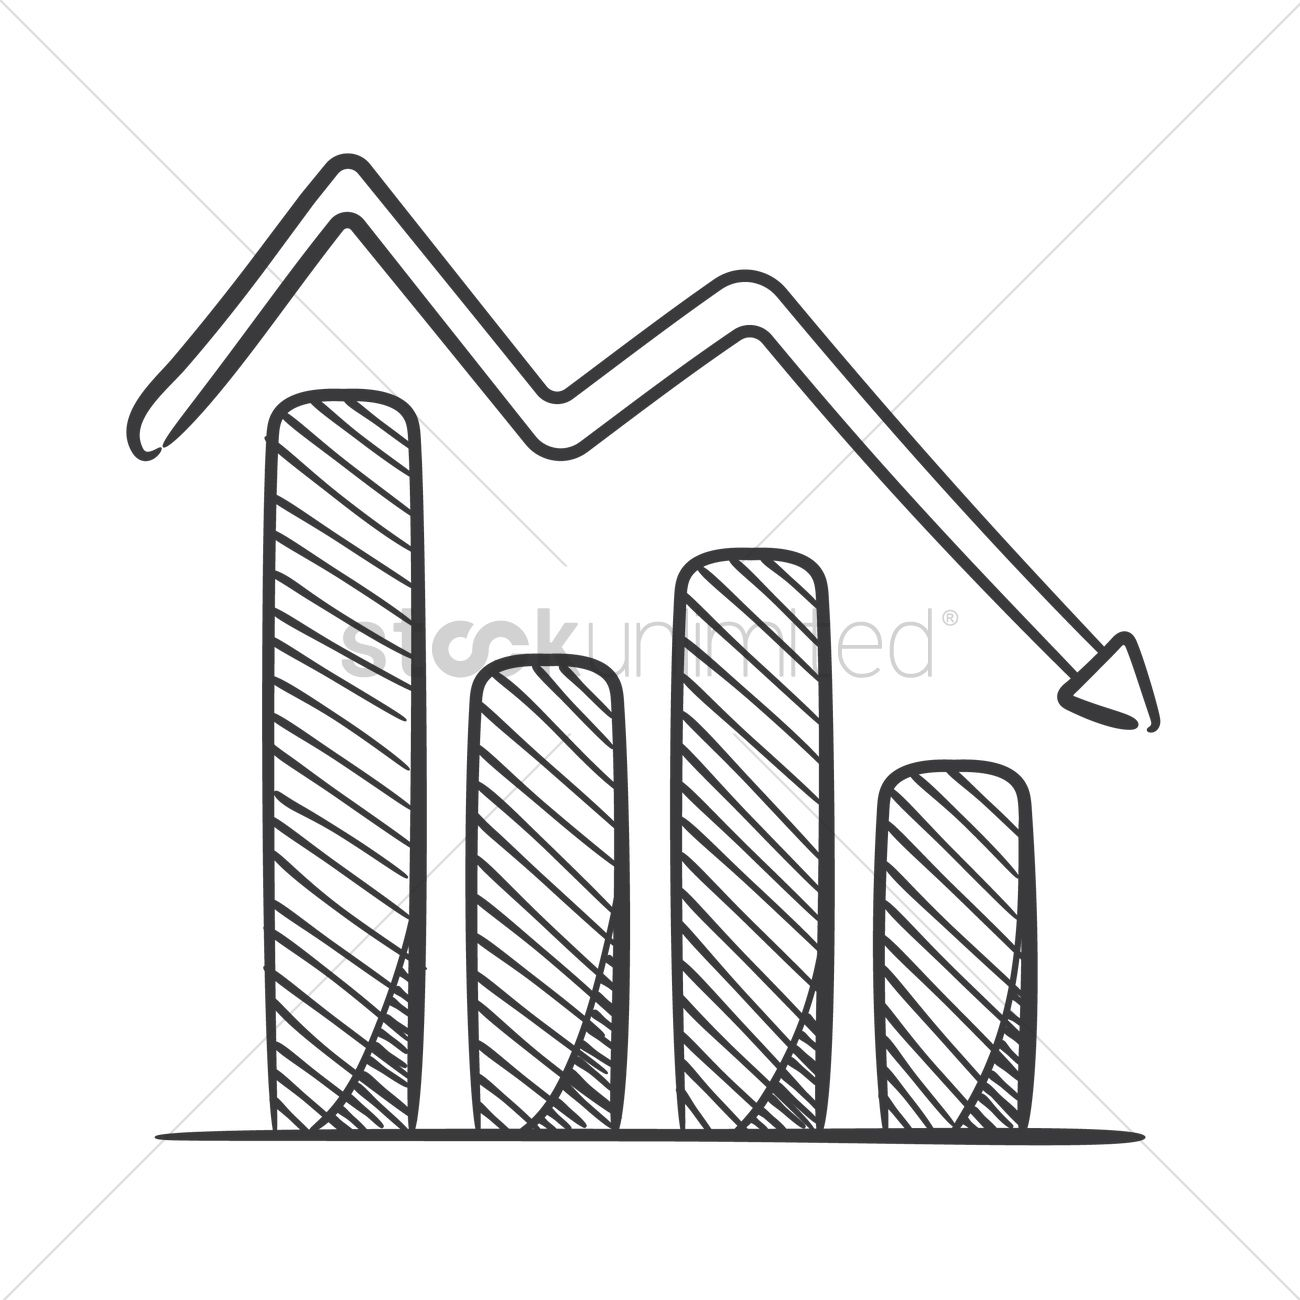 1300x1300 Bar Graph Vector Image